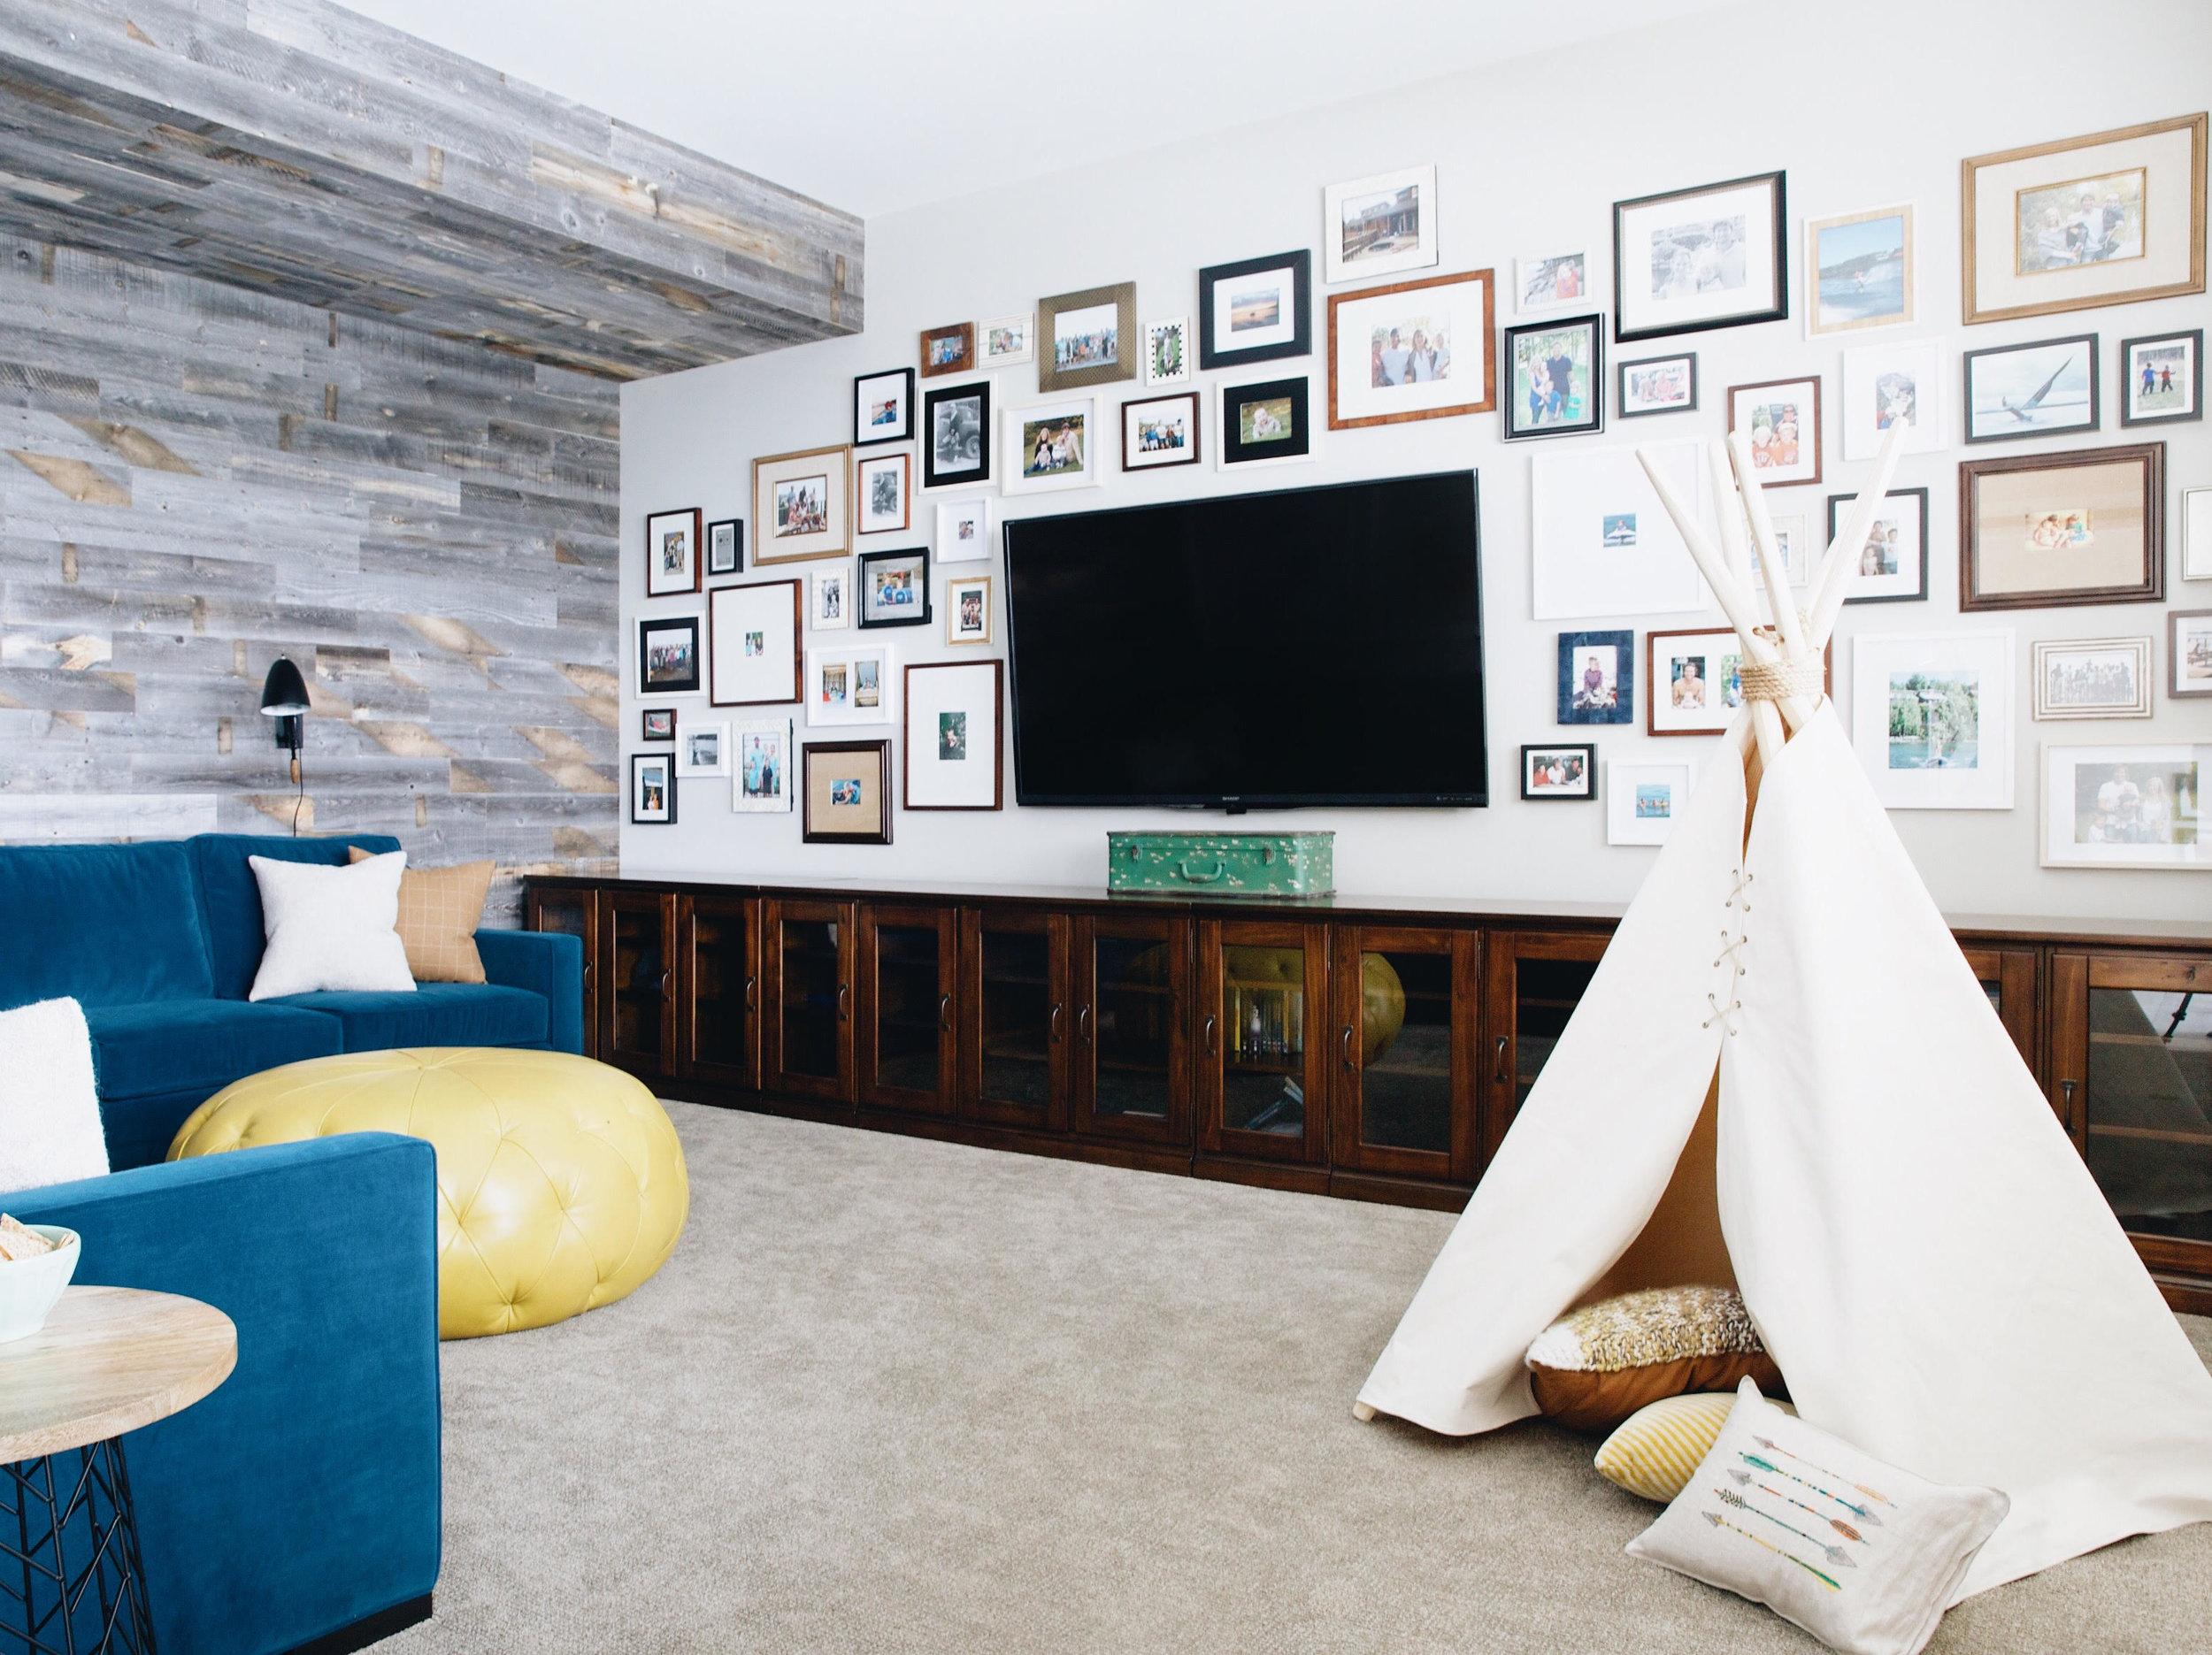 Family Room Gallery Wall, Nyla Free Designs, Calgary Interior Designer, Photo: Phil Crozier